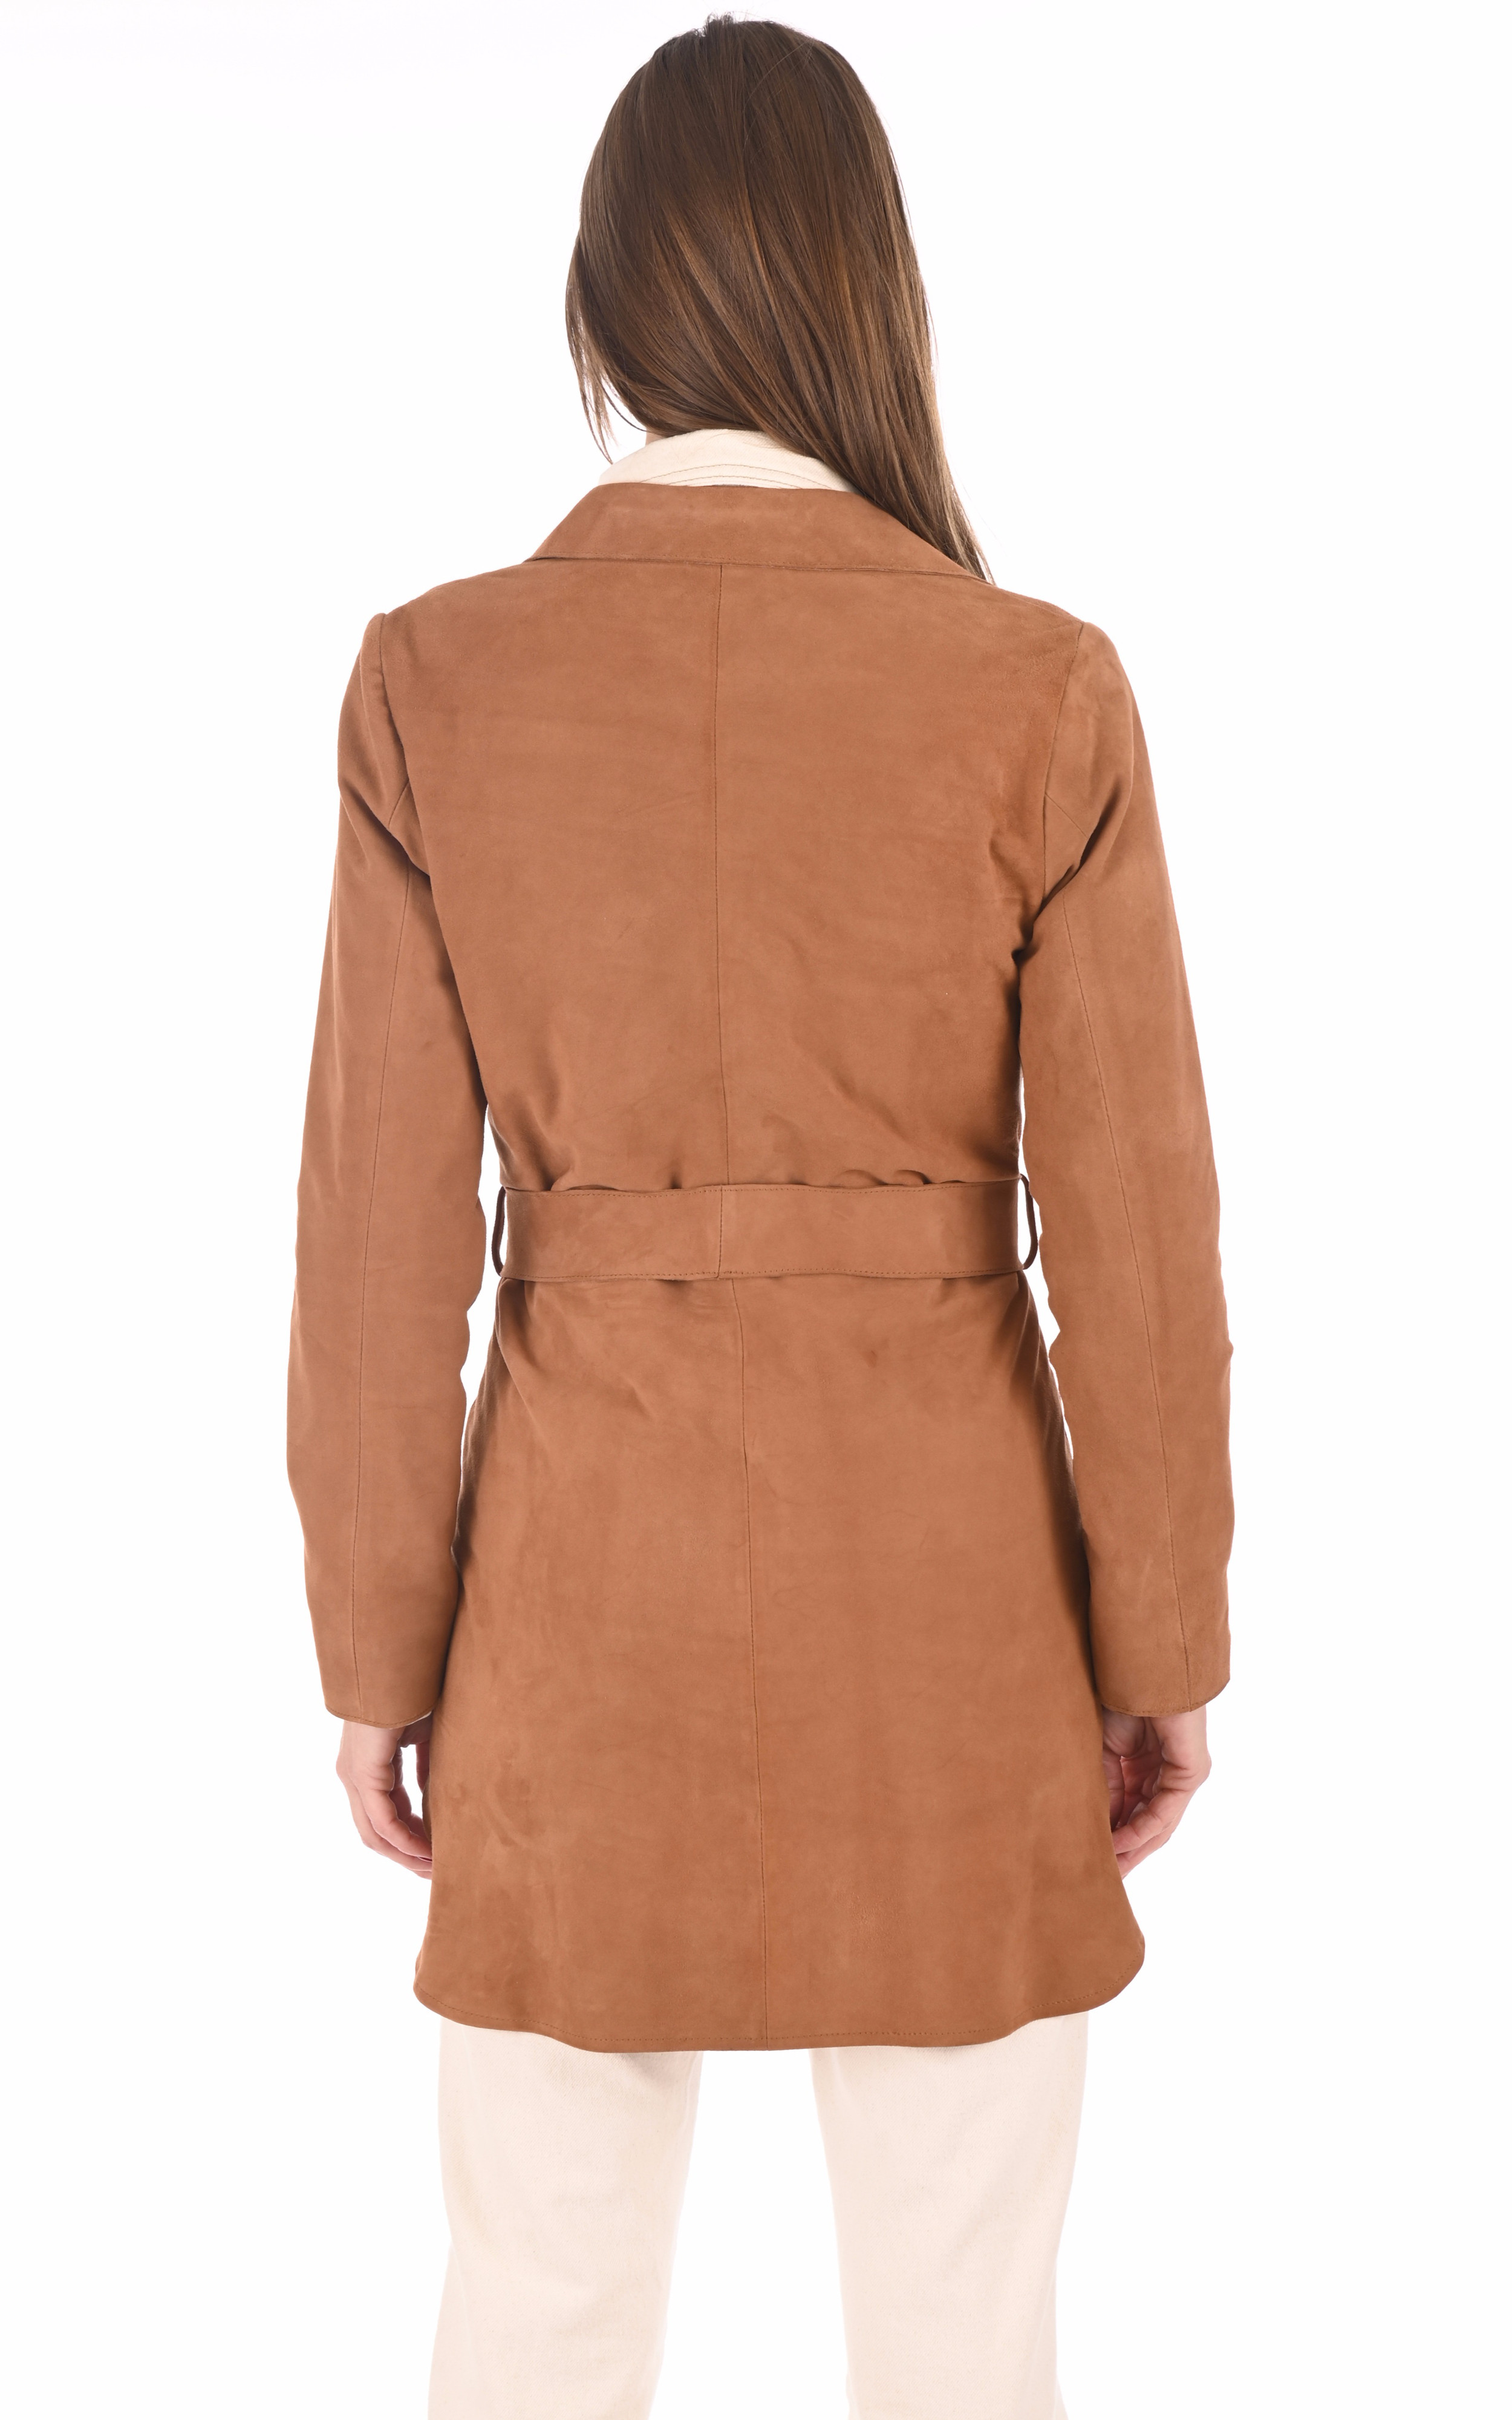 Robe chemise velours cognac Serge Pariente